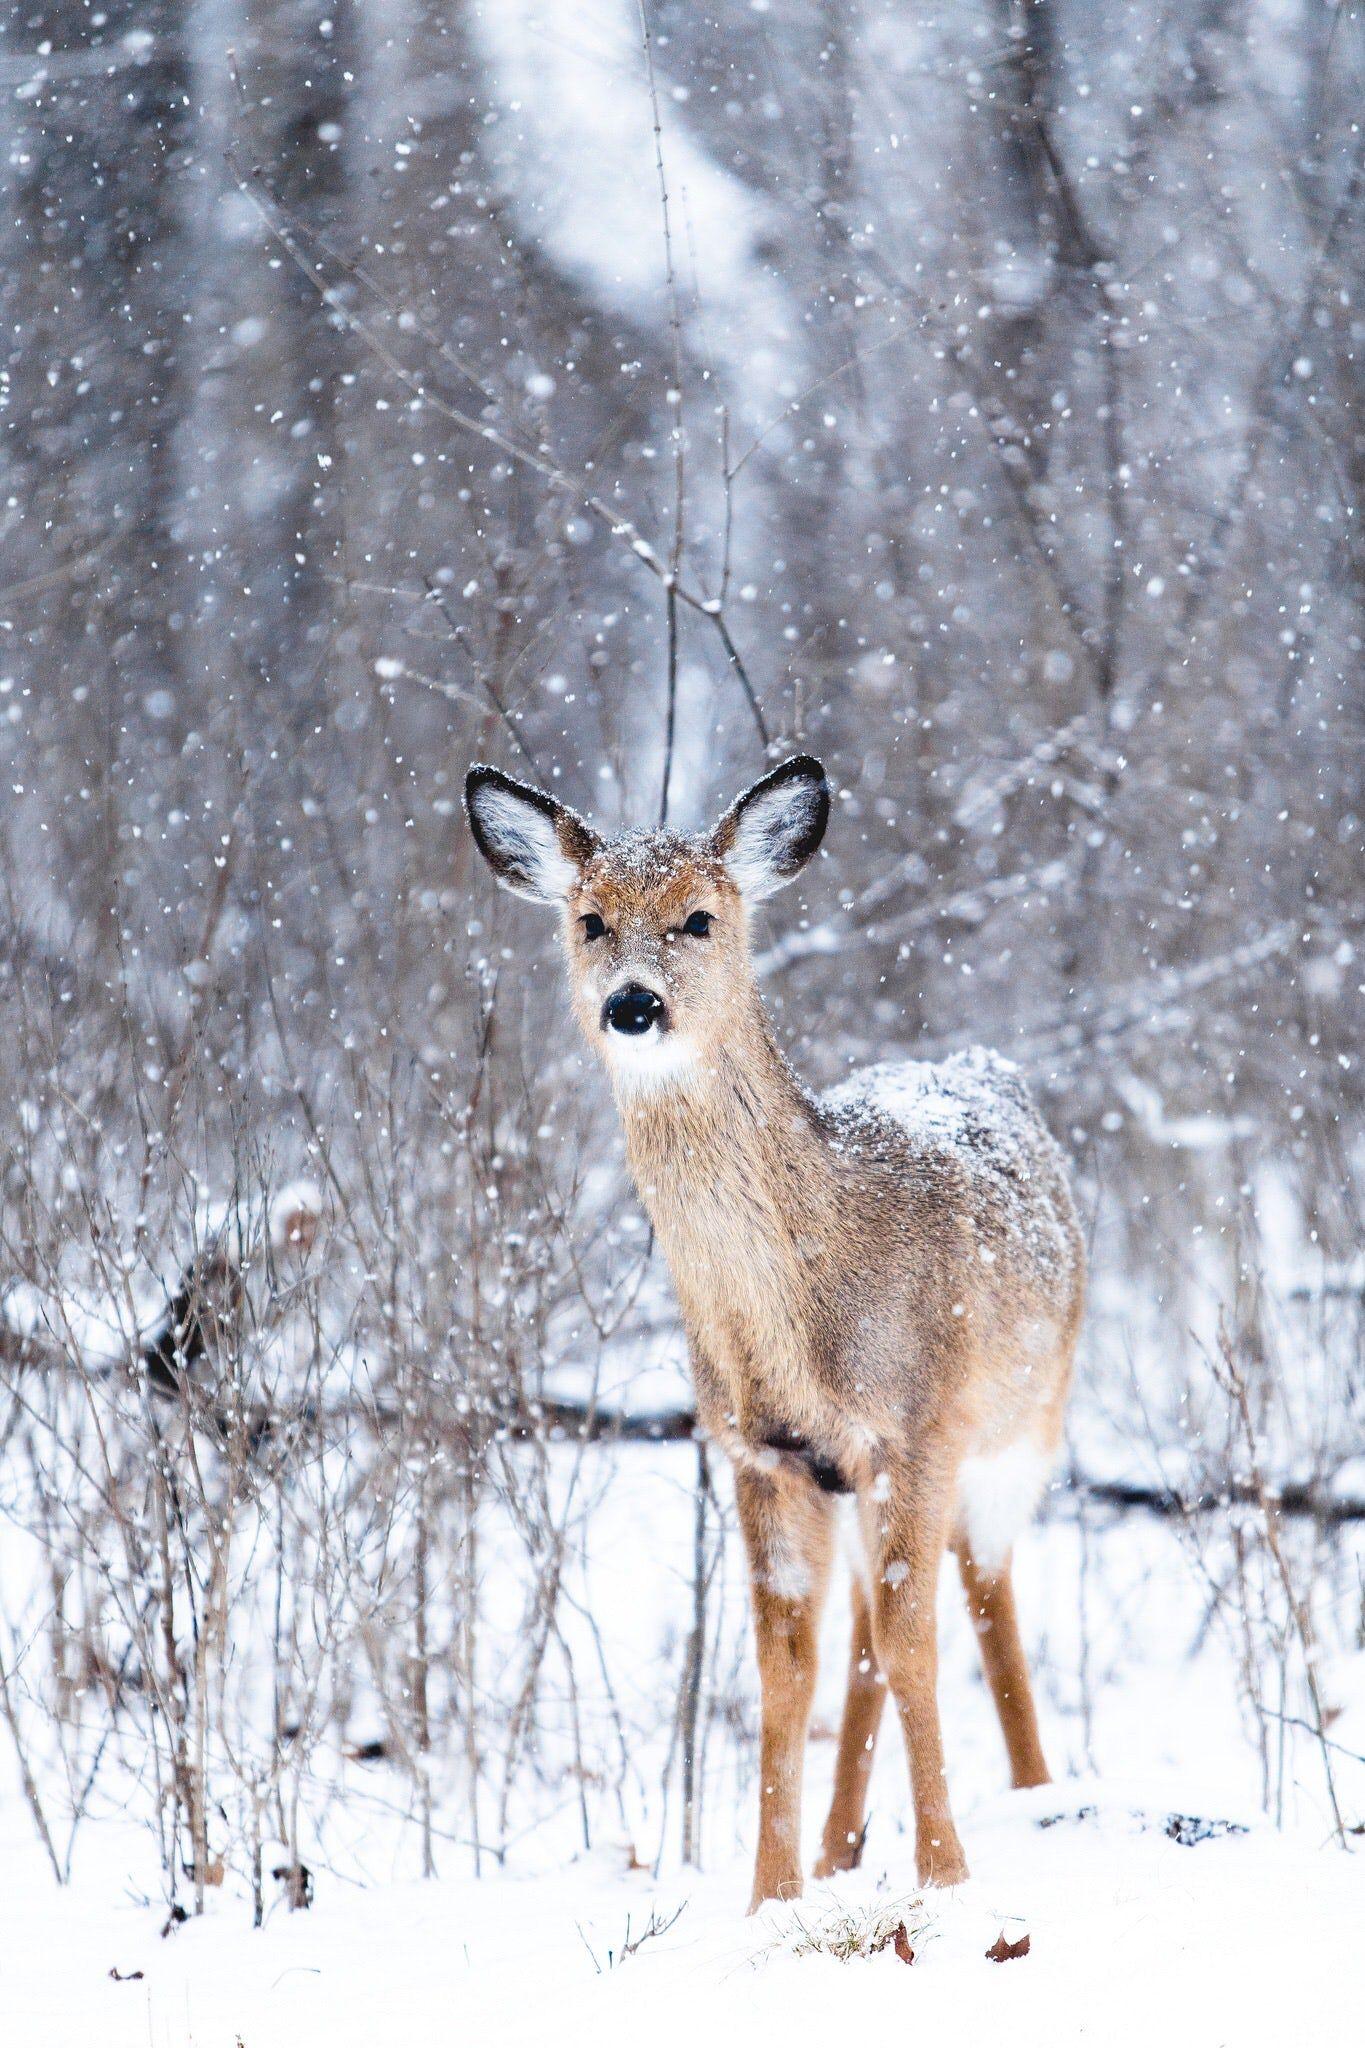 brown deer at winter Animal photo, Winter animals, Deer